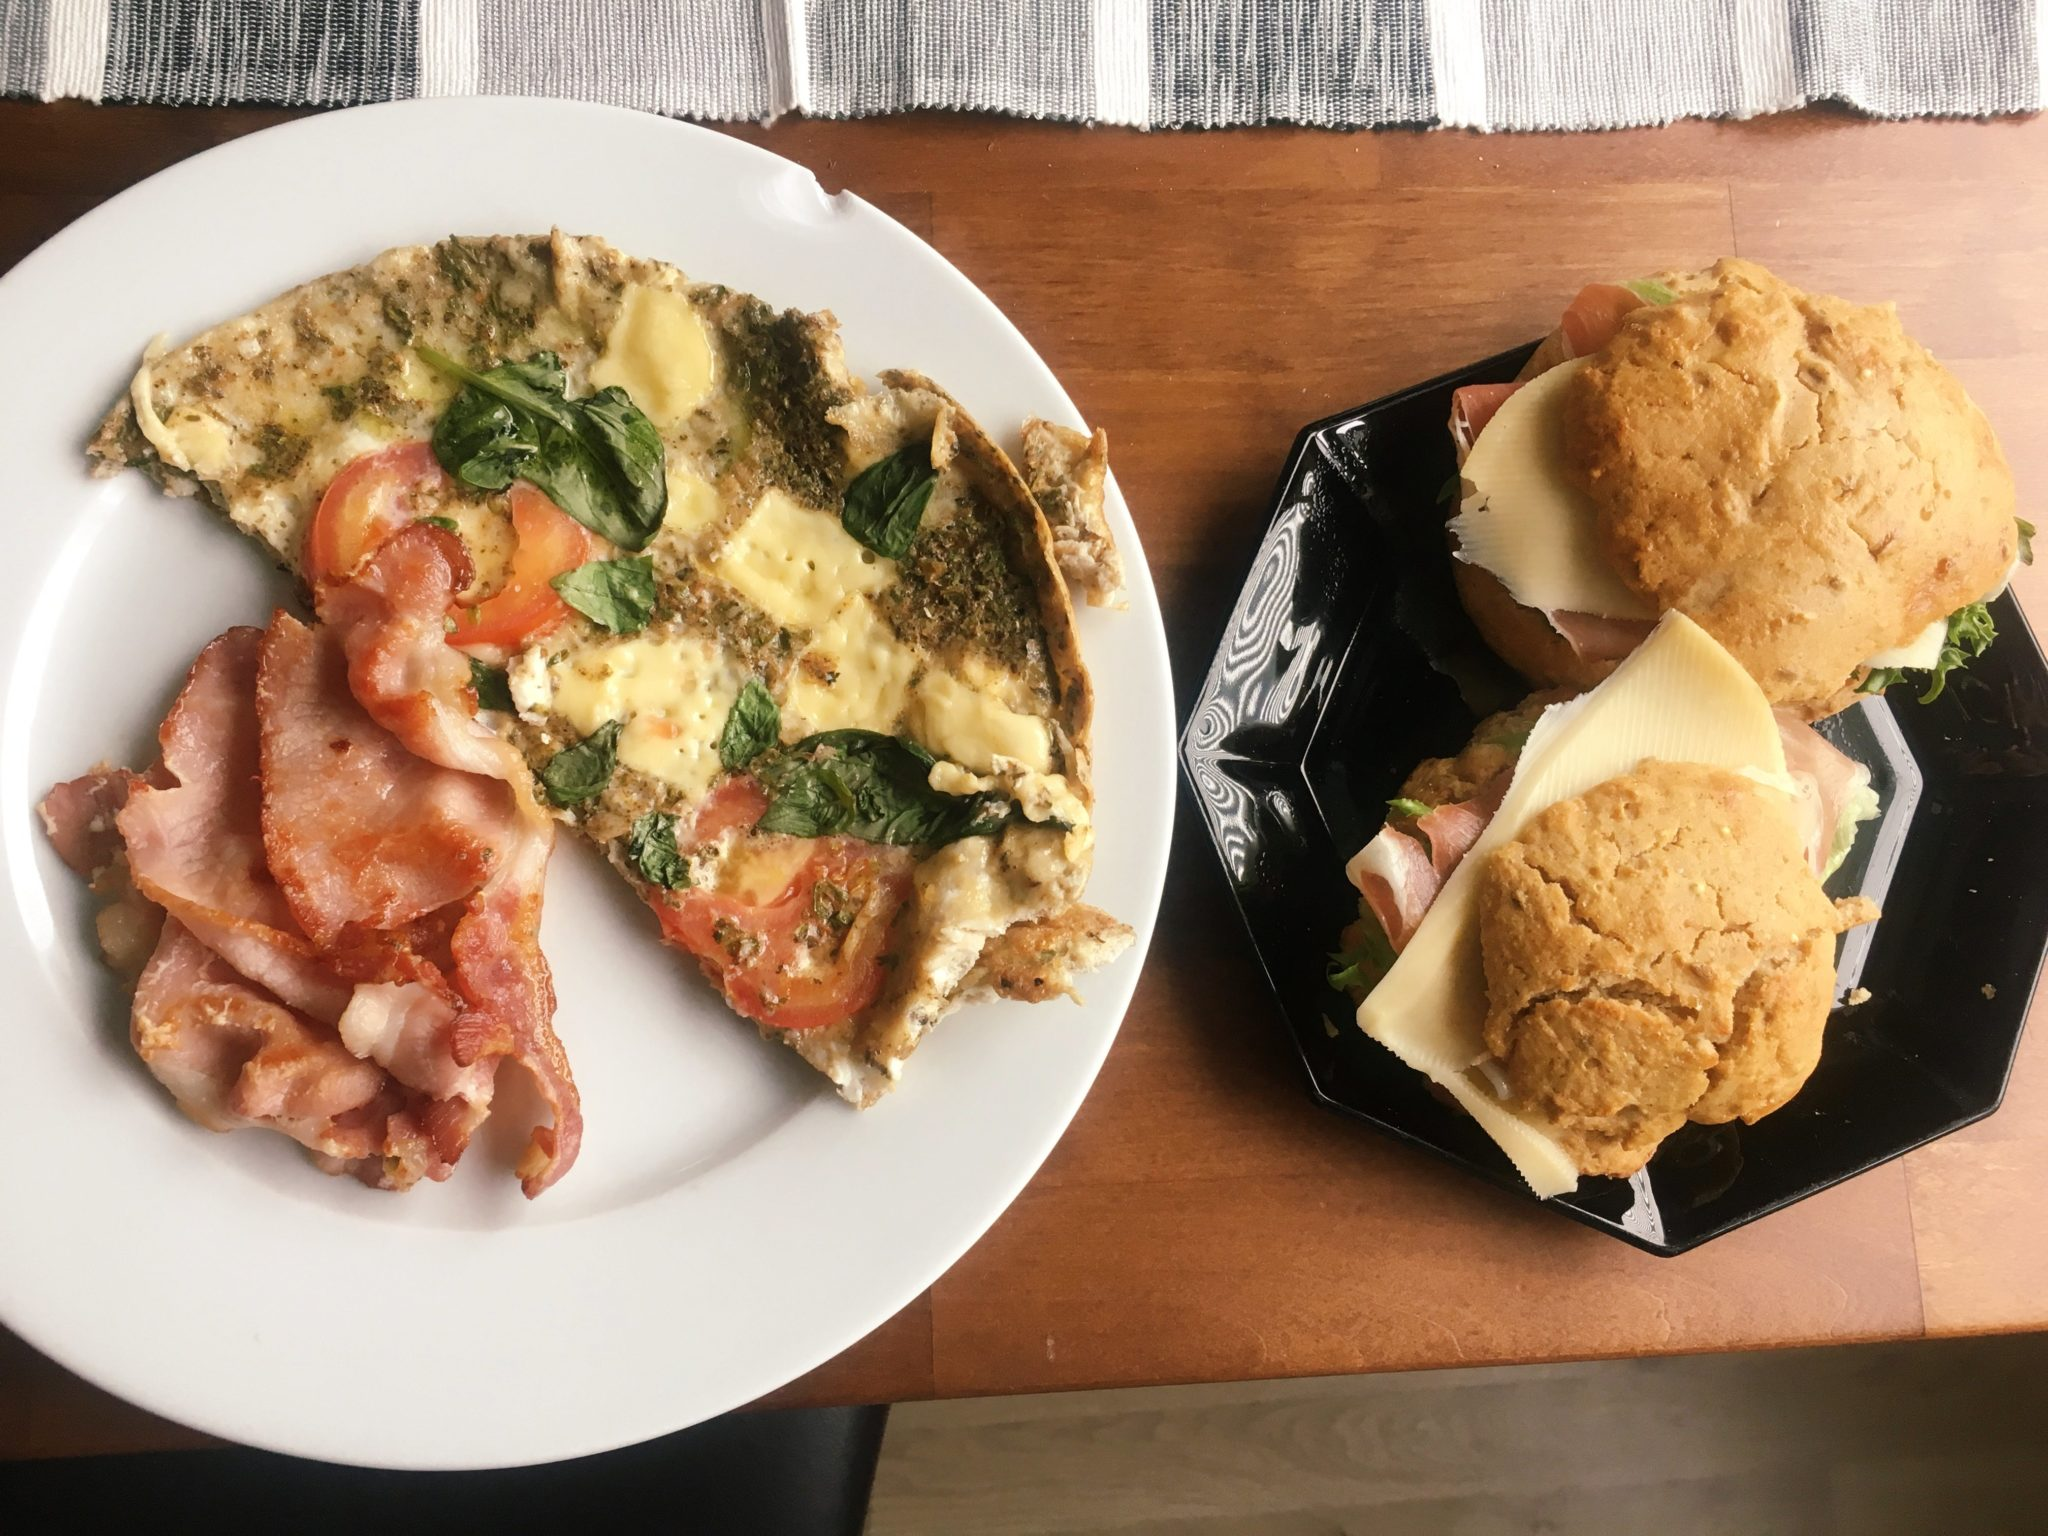 munakas-pekoni-sampylat-aamiainen